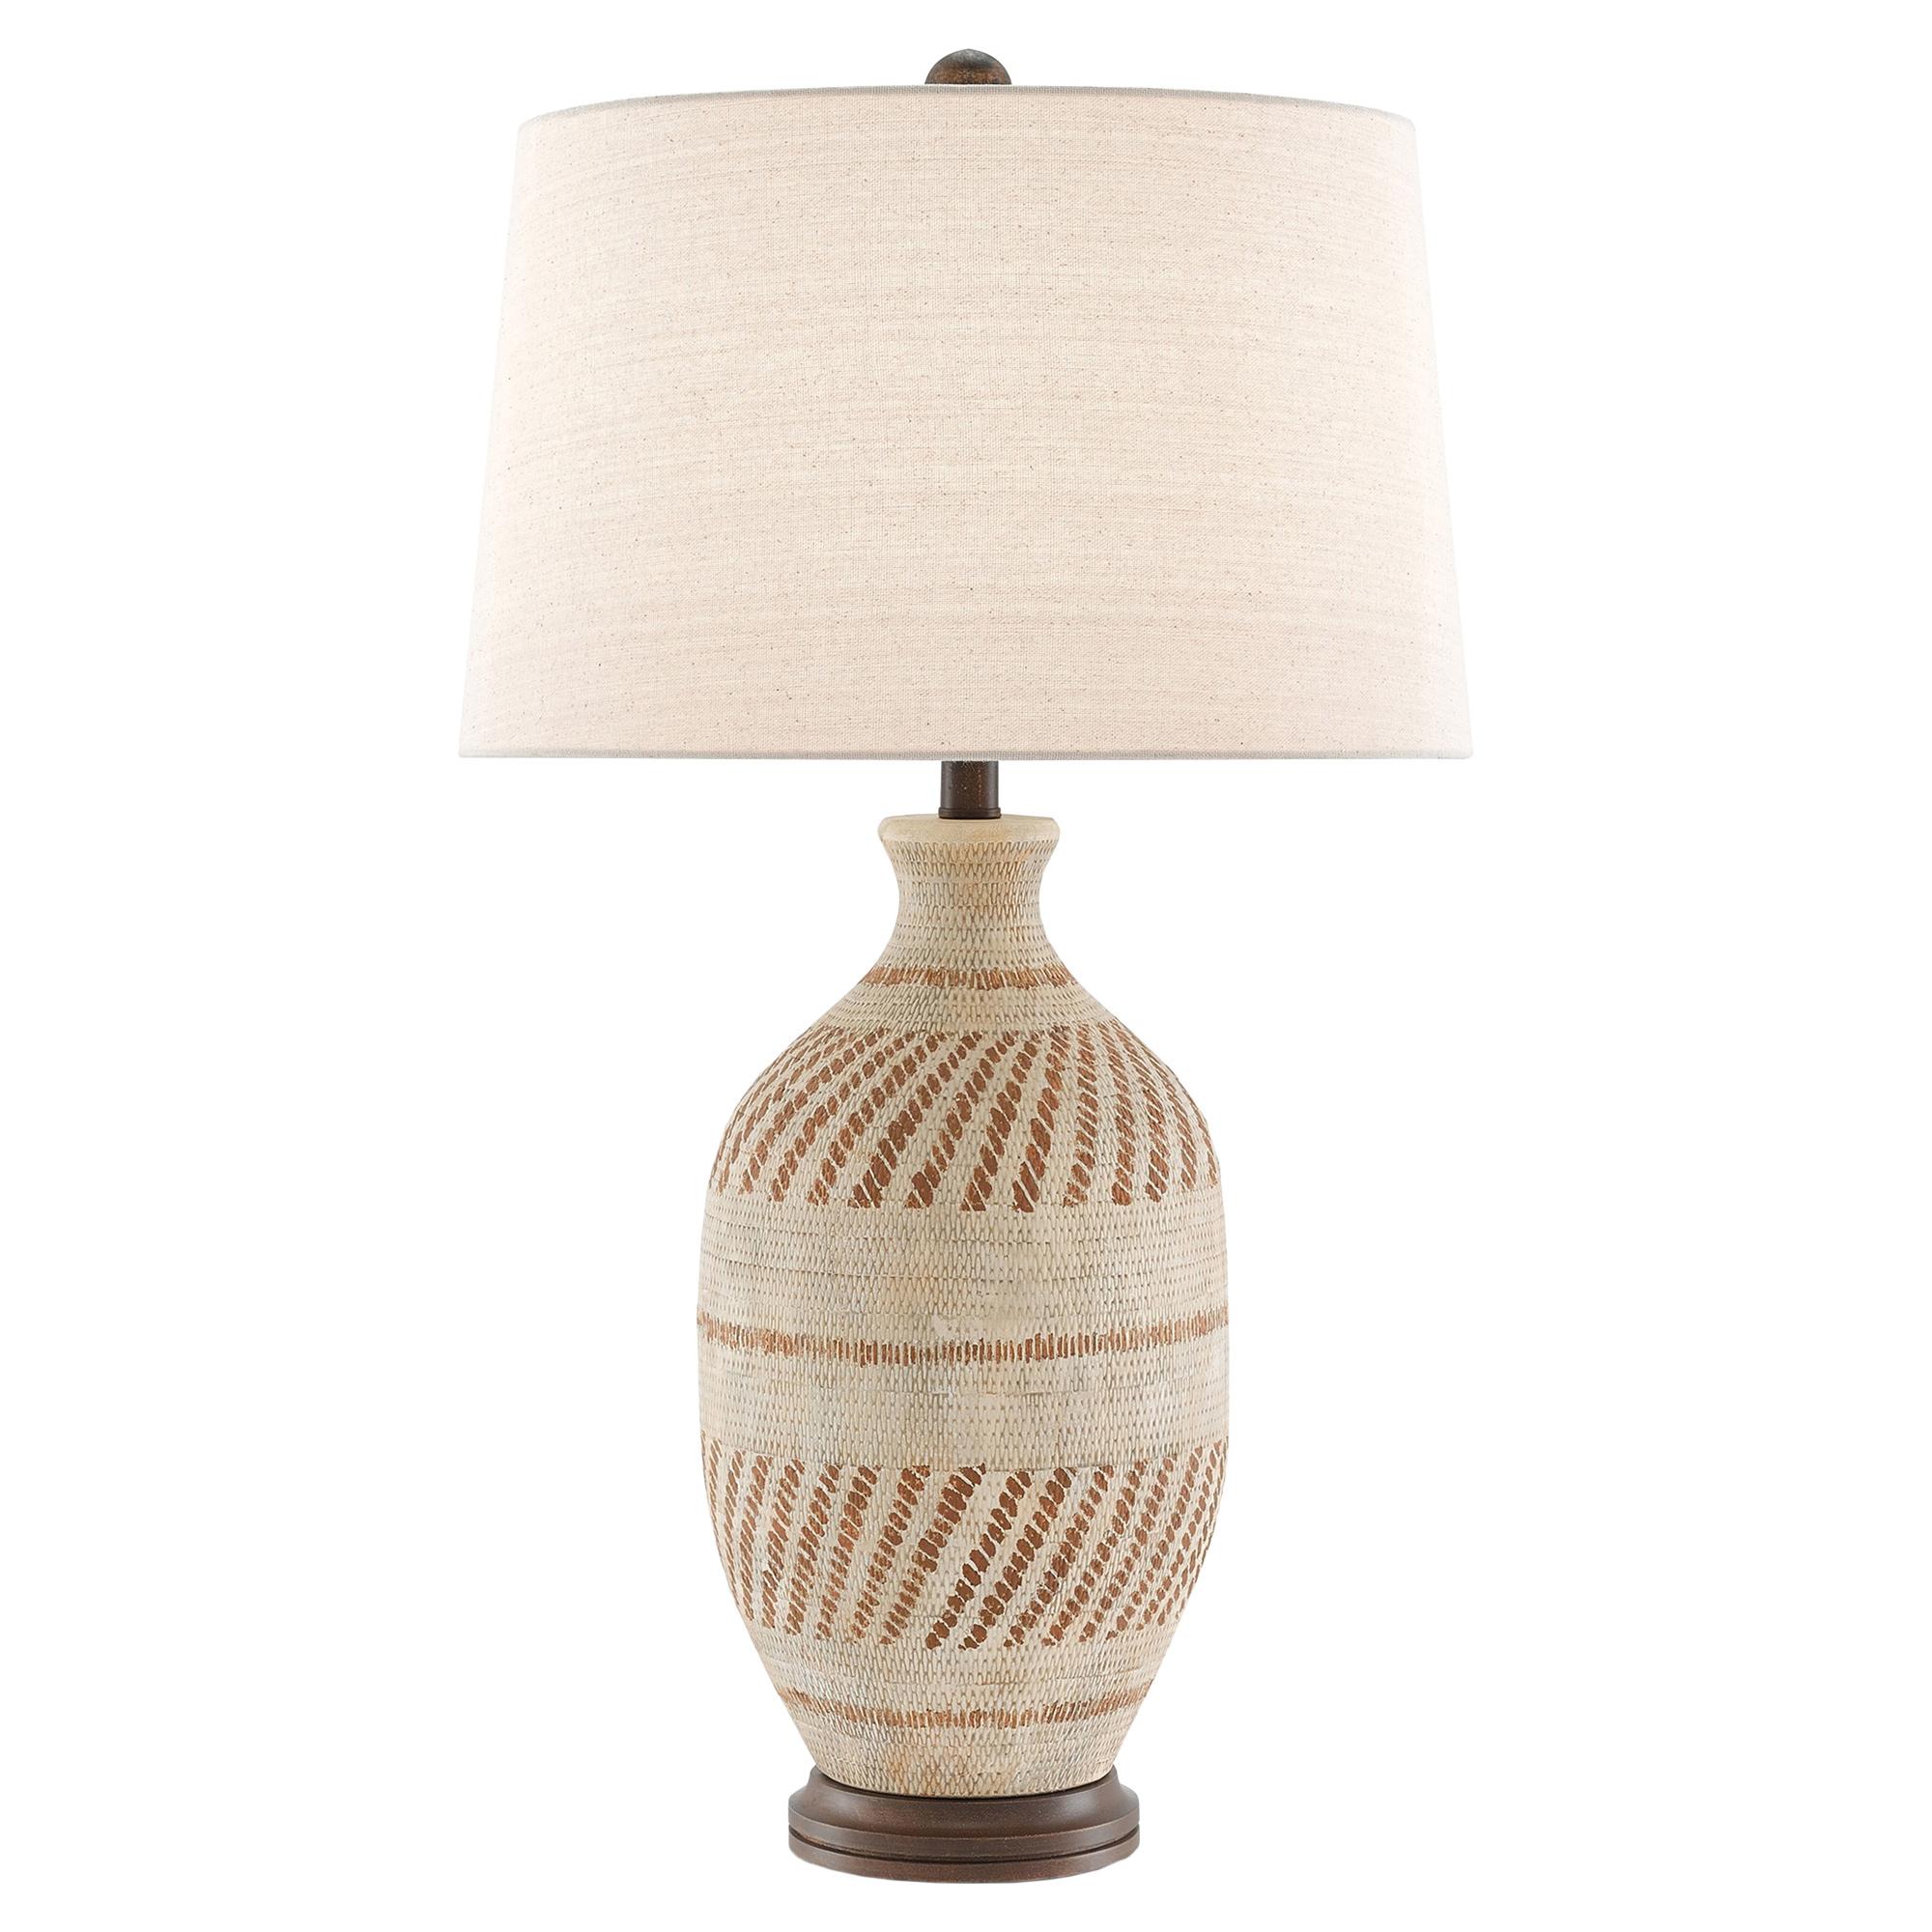 Hassan Bazaar Basketweave Terracotta Table Lamp